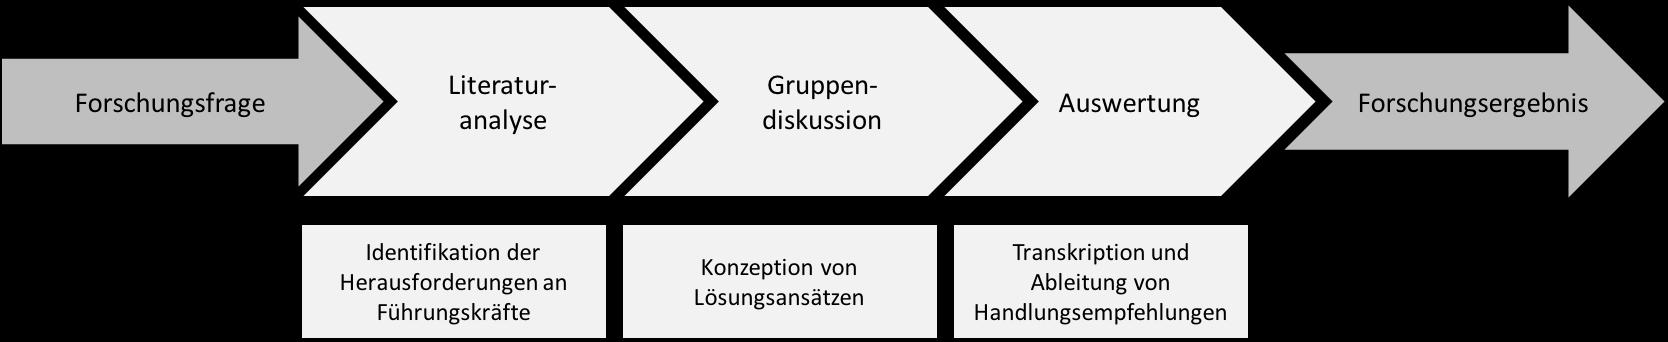 Forschungsdesign qualitativ